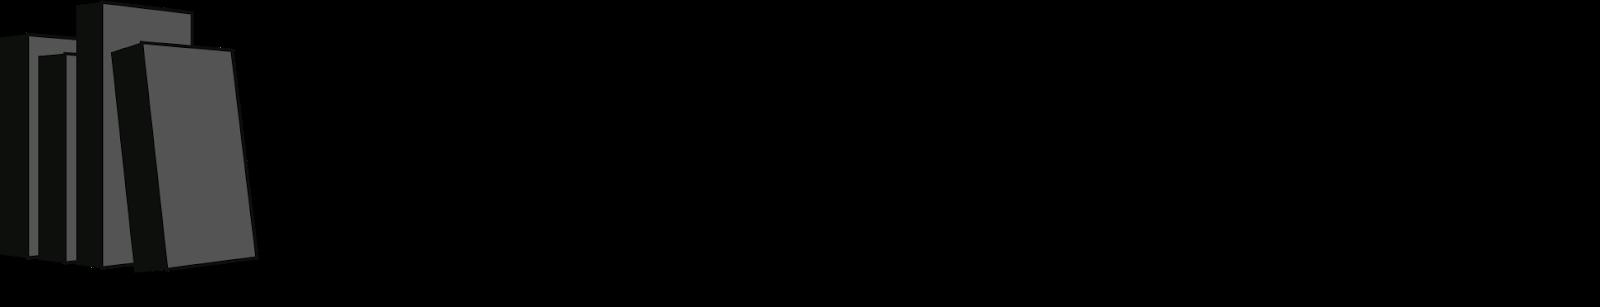 Forlaget mellemgaard